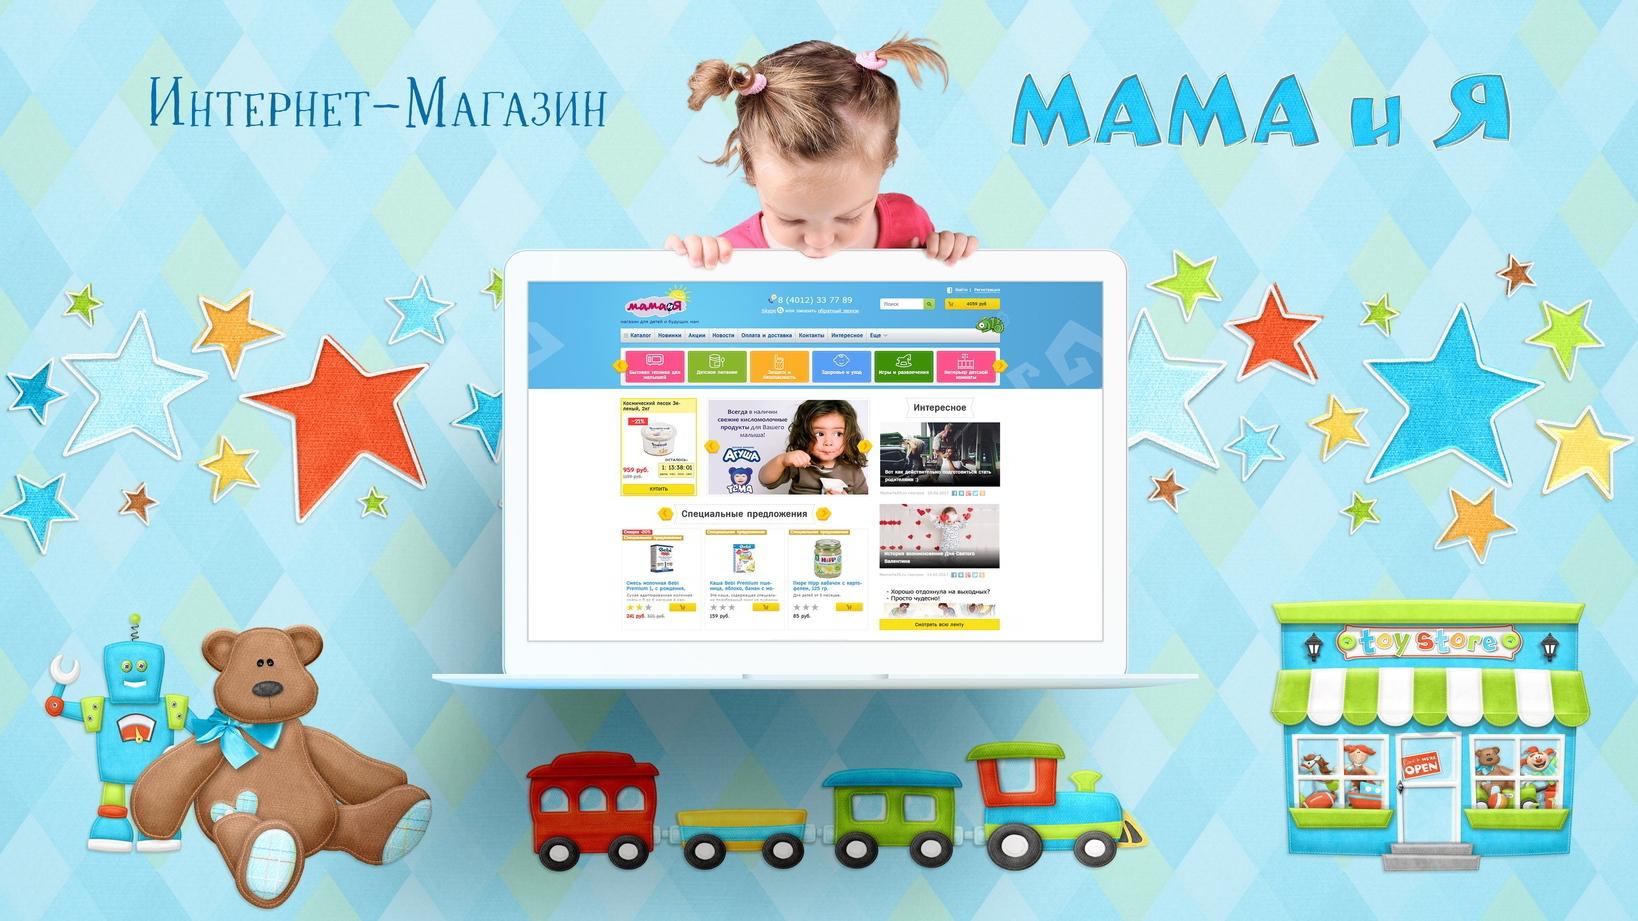 4c4a1ec2292d Создание интернет-магазина МАМА и Я - студия COWORK